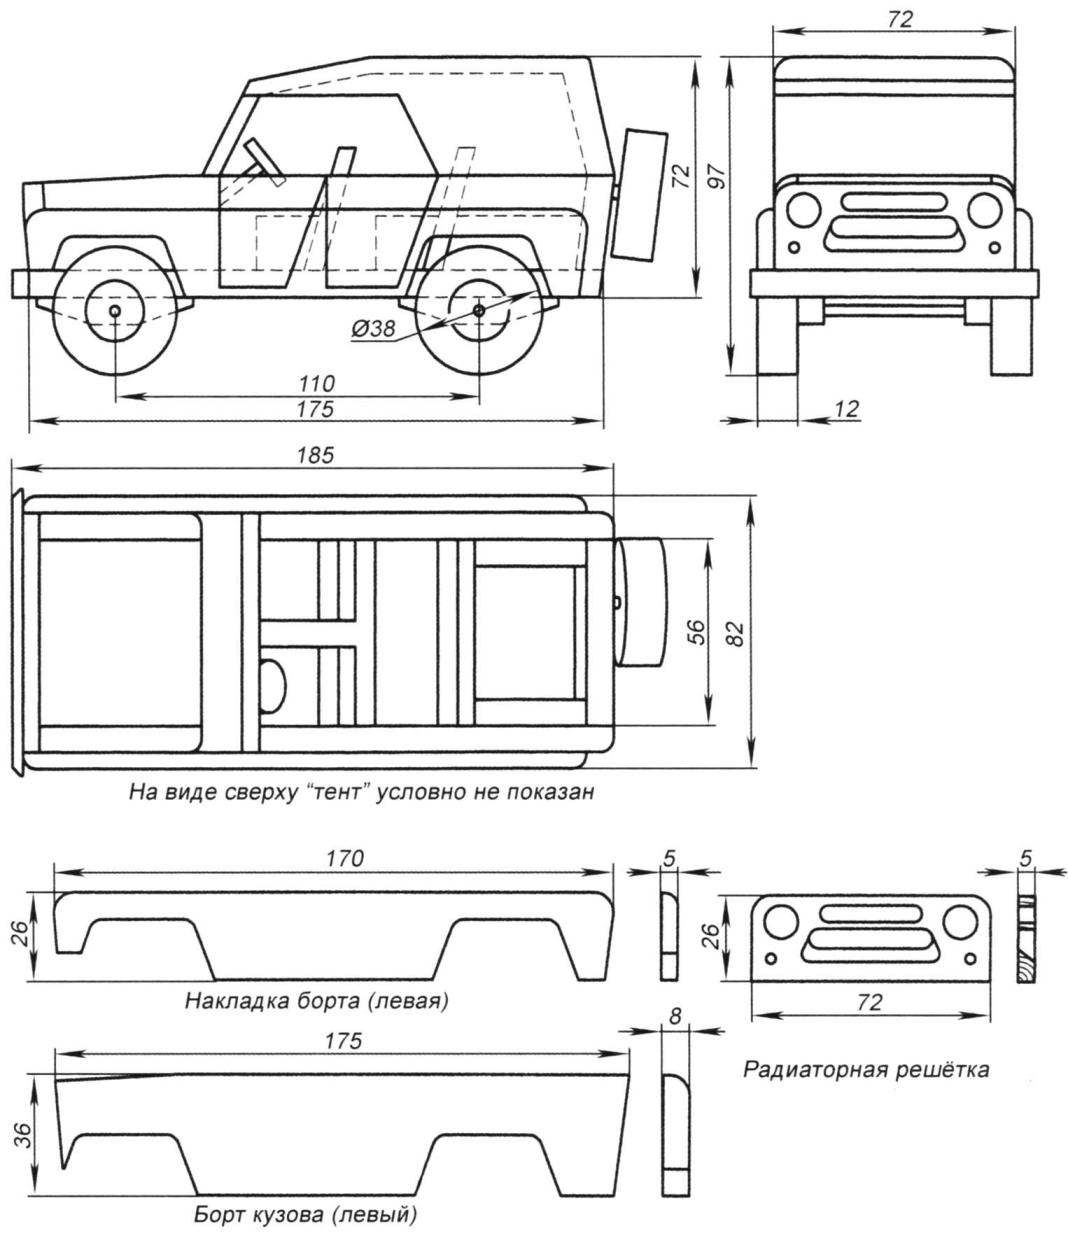 SUV Ulyanovsk automobile plant (UAZ)